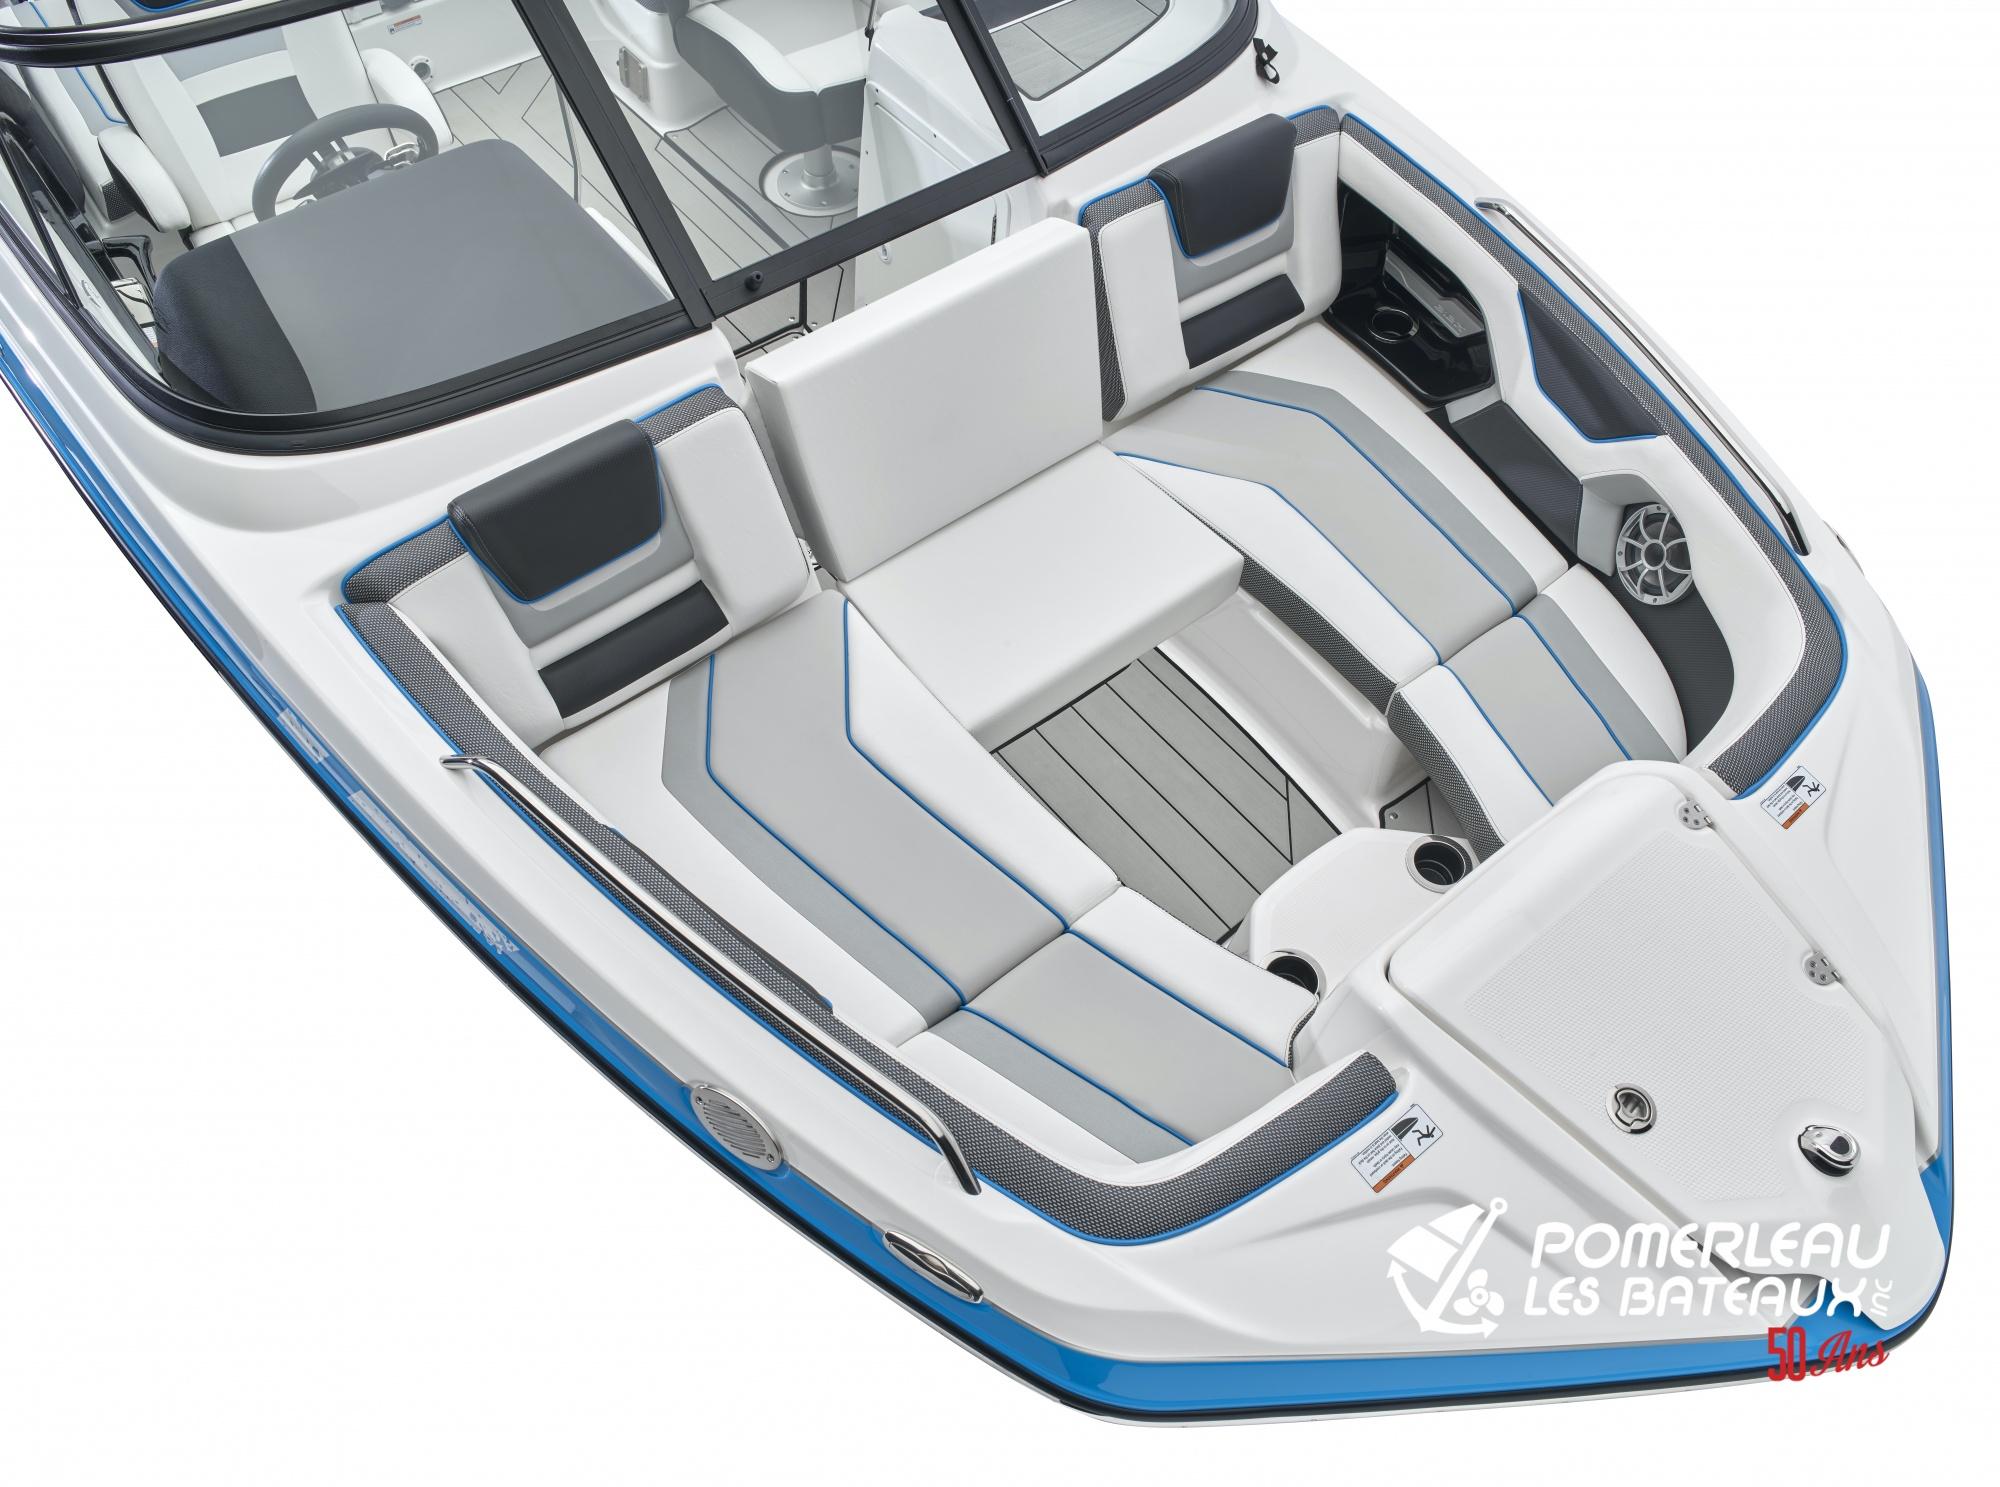 Yamaha 212 XE - 212XD_Bow Seating-4